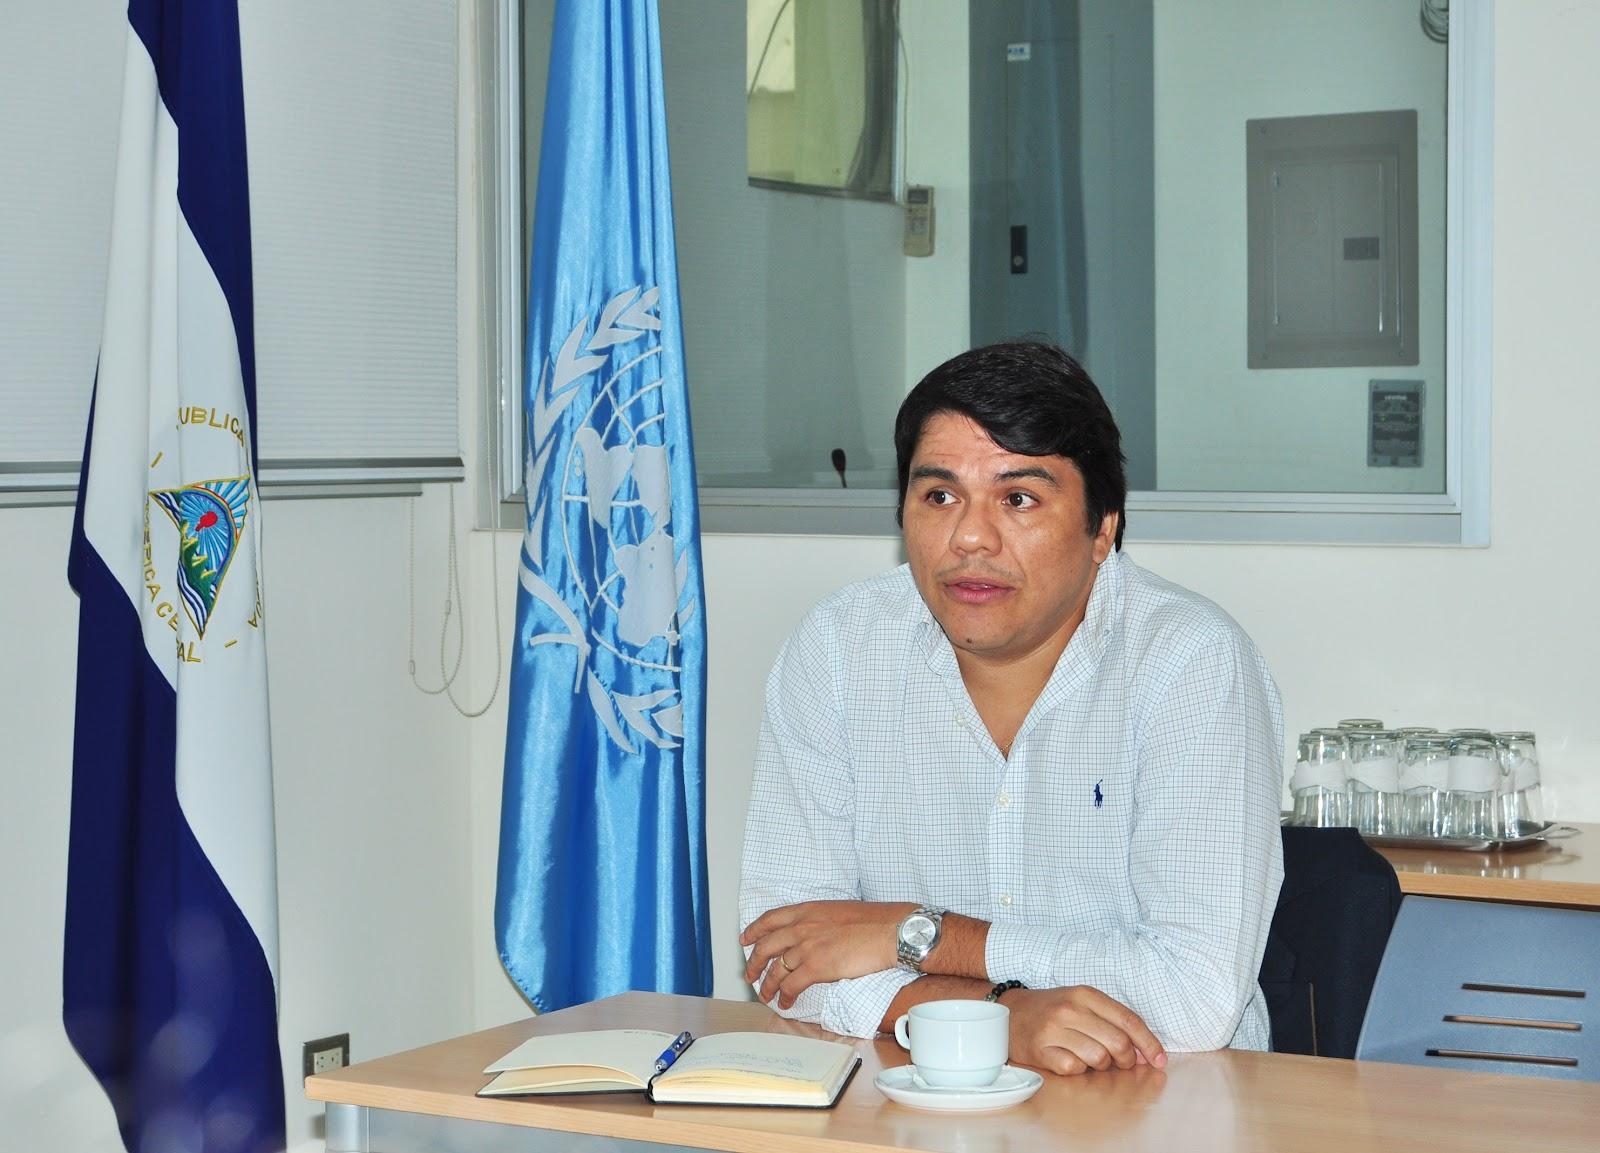 Sr. Víctor Valdivieso, Representante Auxiliar de UNFPA Nicaragua